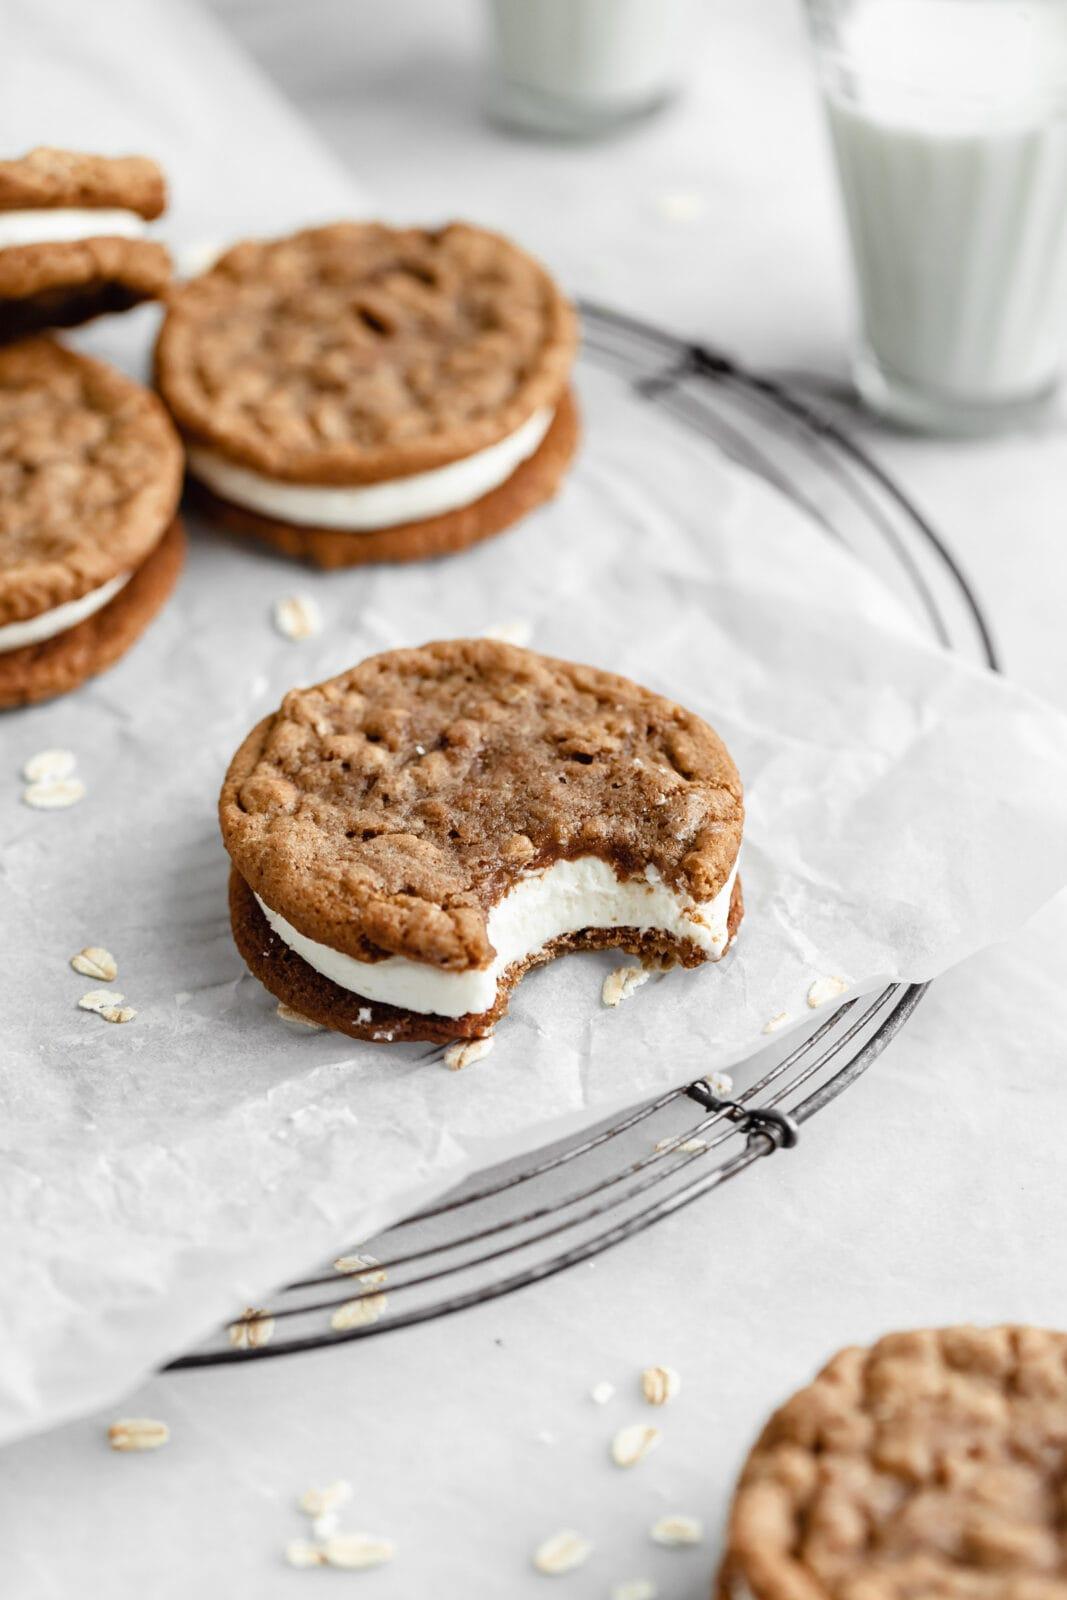 homemade oatmeal creme pie on plate